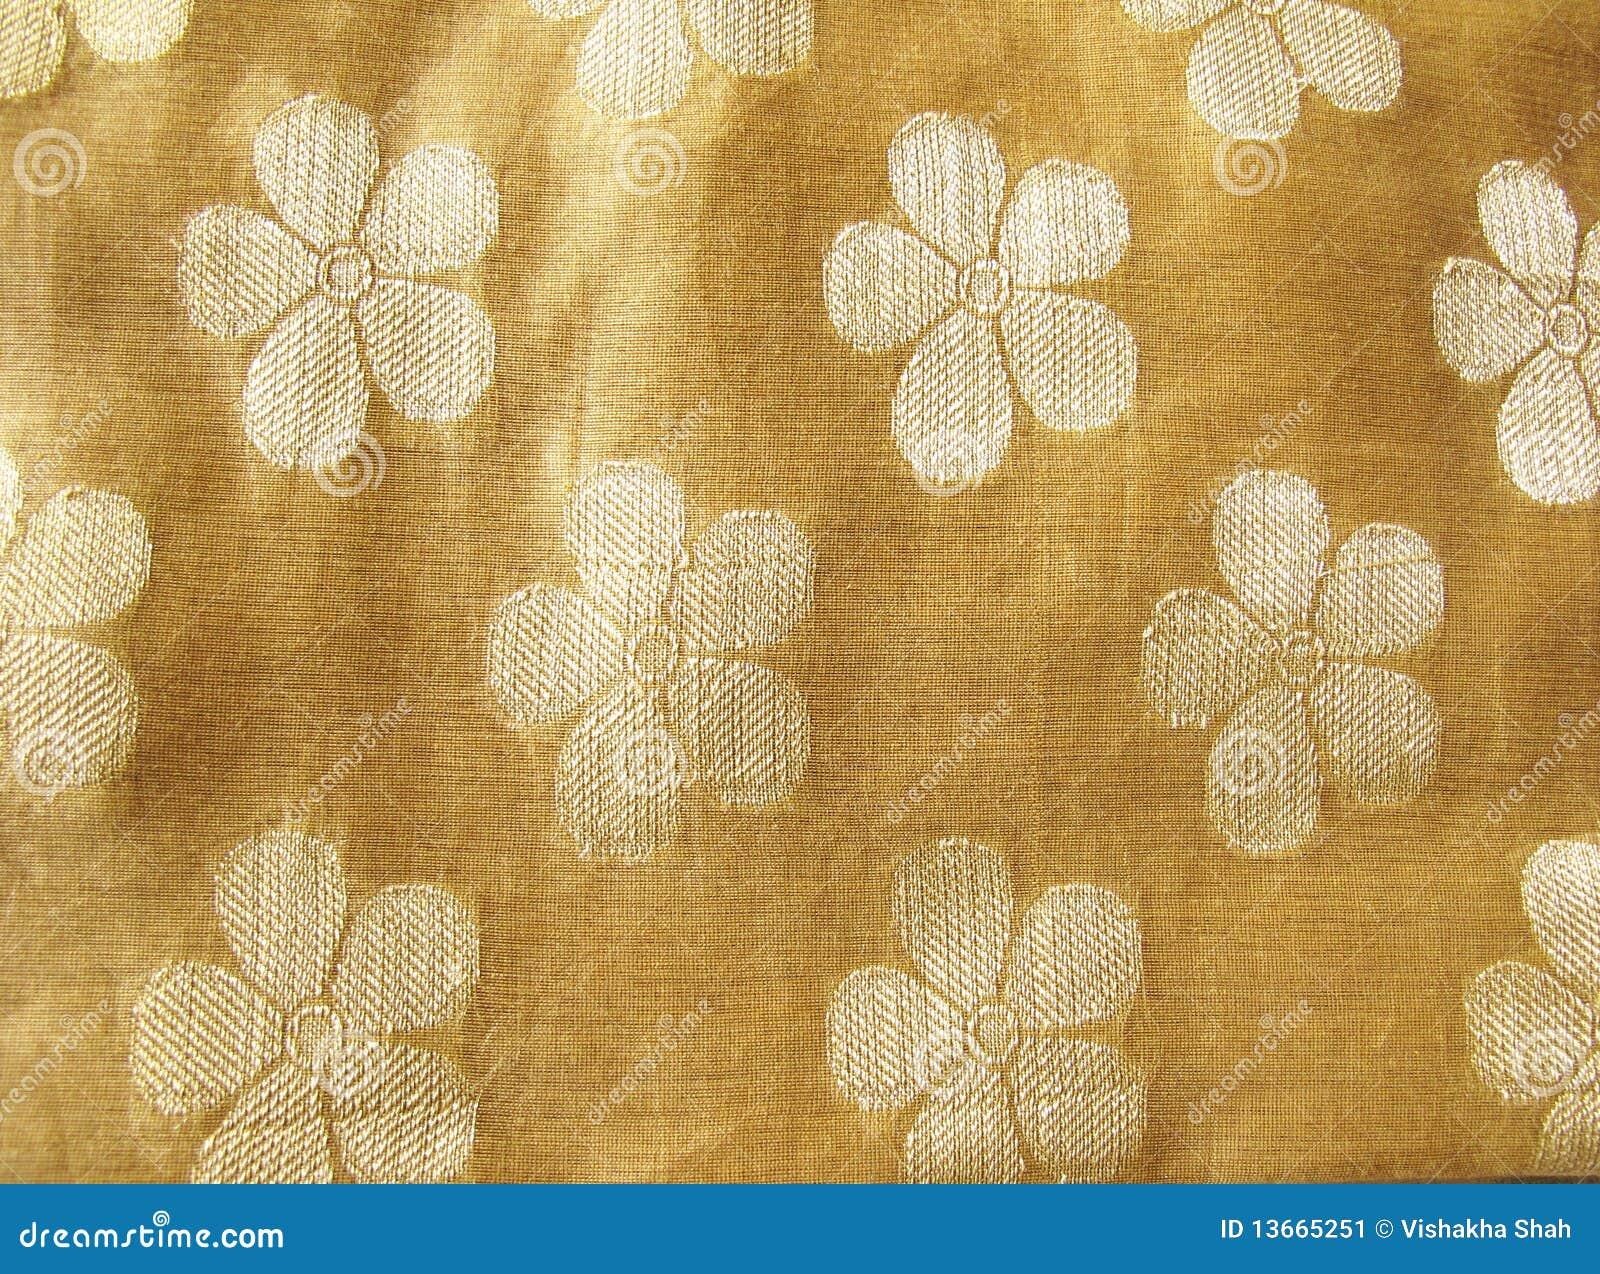 Floral silk fabric